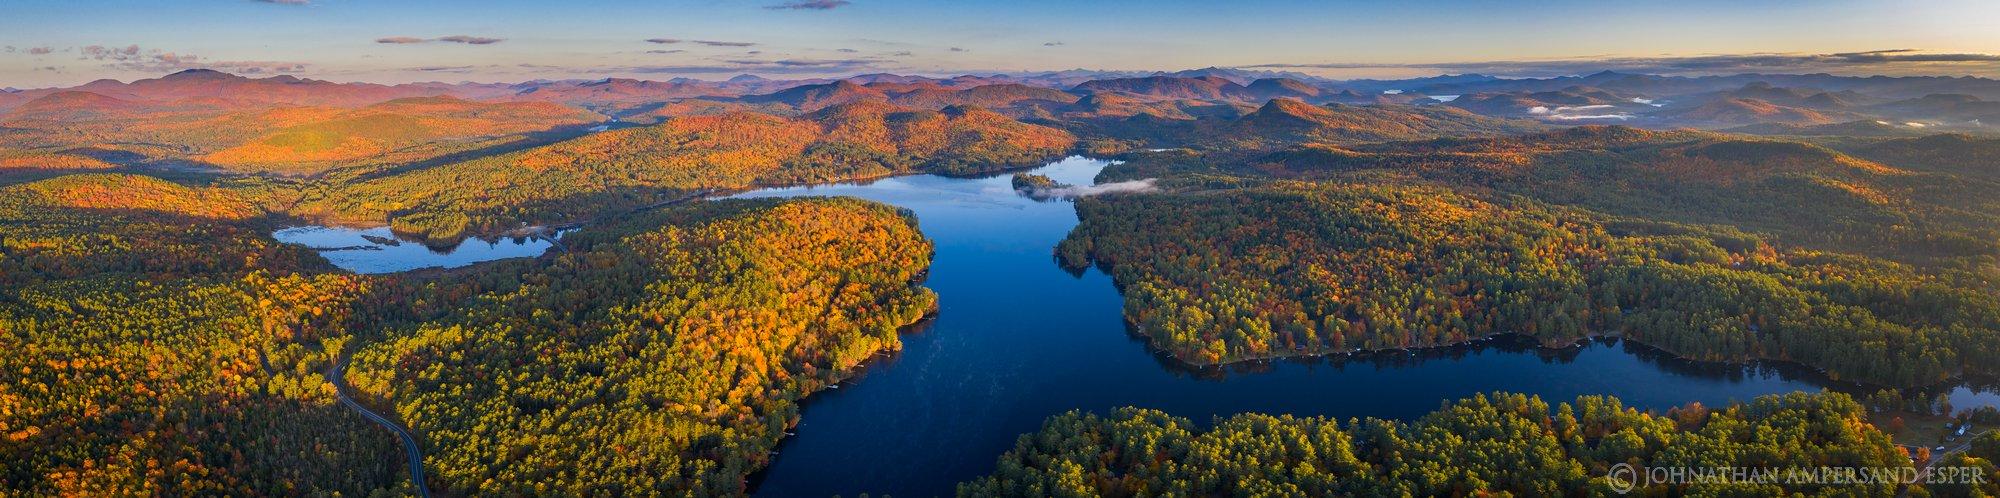 Loon Lake,drone,fall,2019,autumn,panorama,drone panorama,Gore Mt,High Peaks,